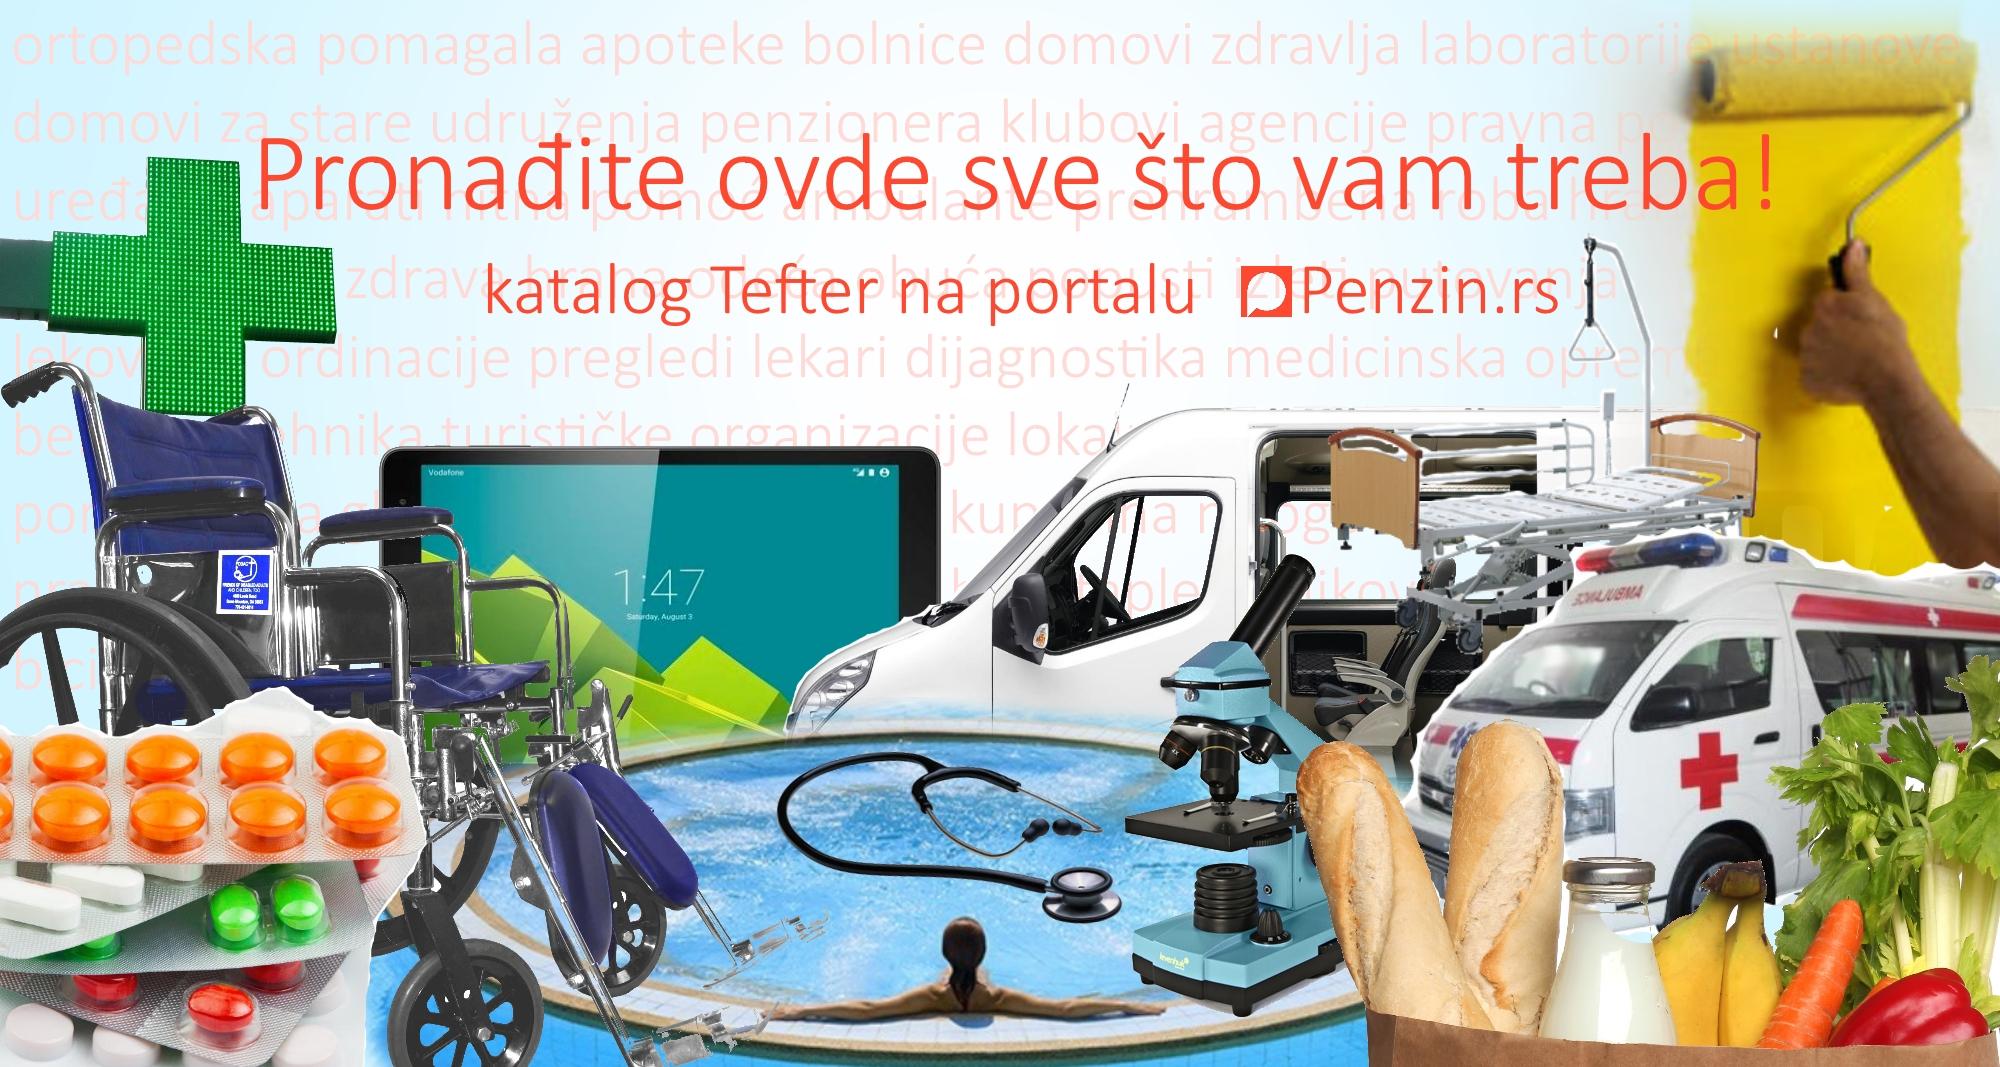 penzin-tefter-katalog-apoteke-domovi-stari-penzioneri-radnje-kupovina-prodaja-izleti